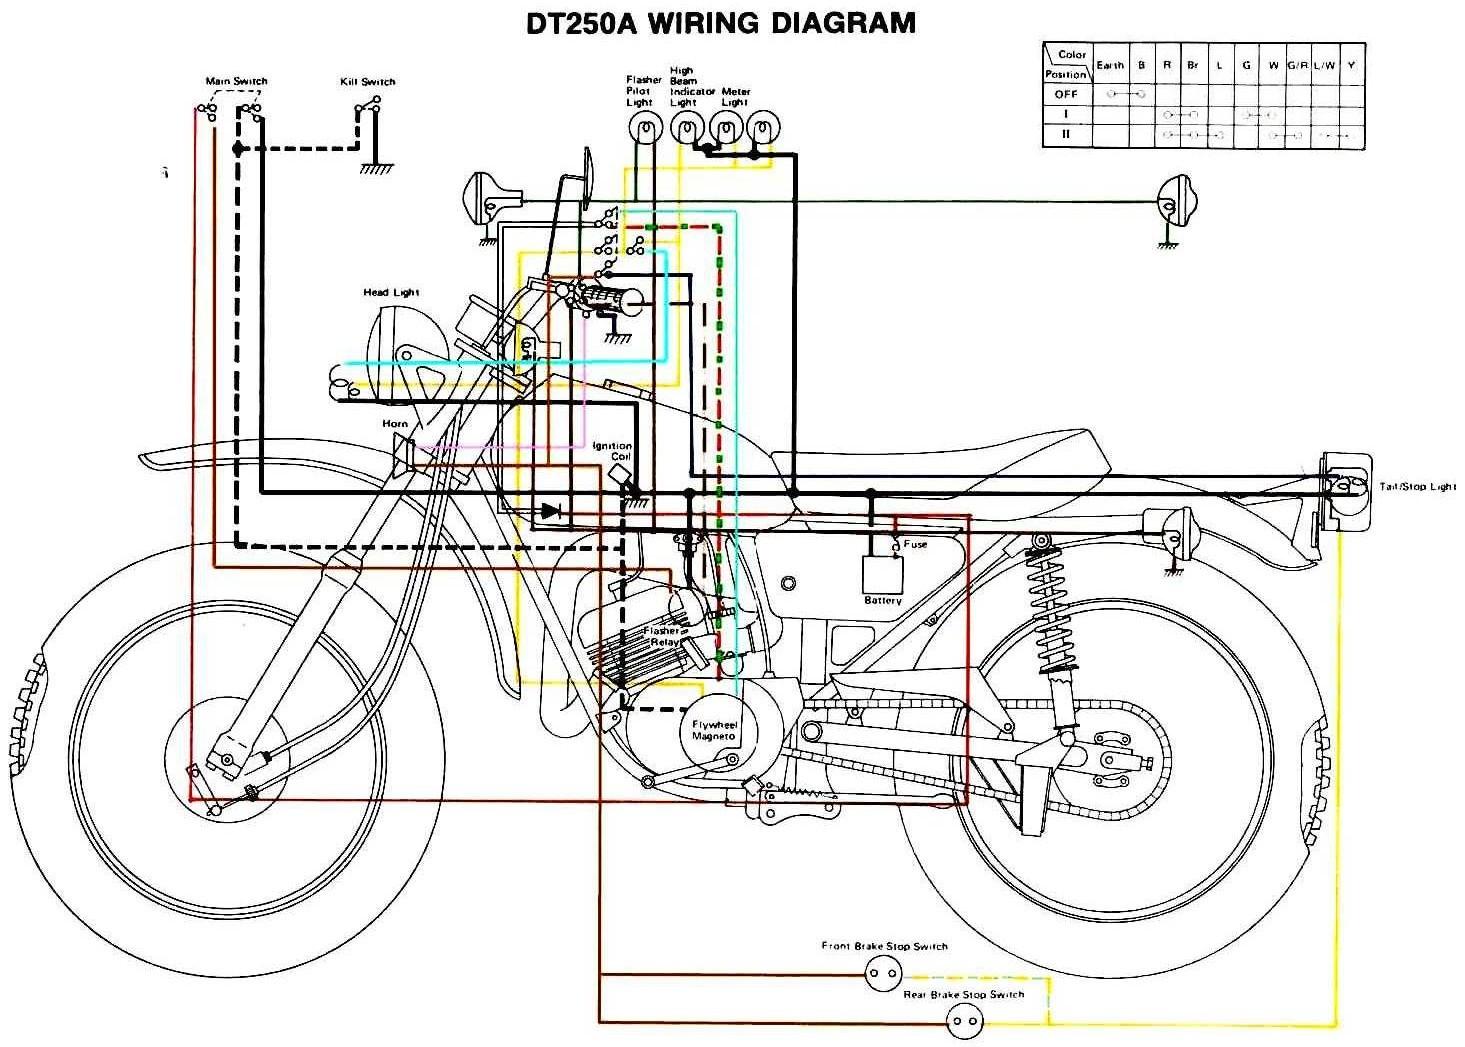 It175 Wiring Diagram - 91 Chevy 4l80e Transmission Wiring Diagram - rccar- wiring.2010menanti.jeanjaures37.fr | Dt1 Wiring Diagram |  | Wiring Diagram Resource